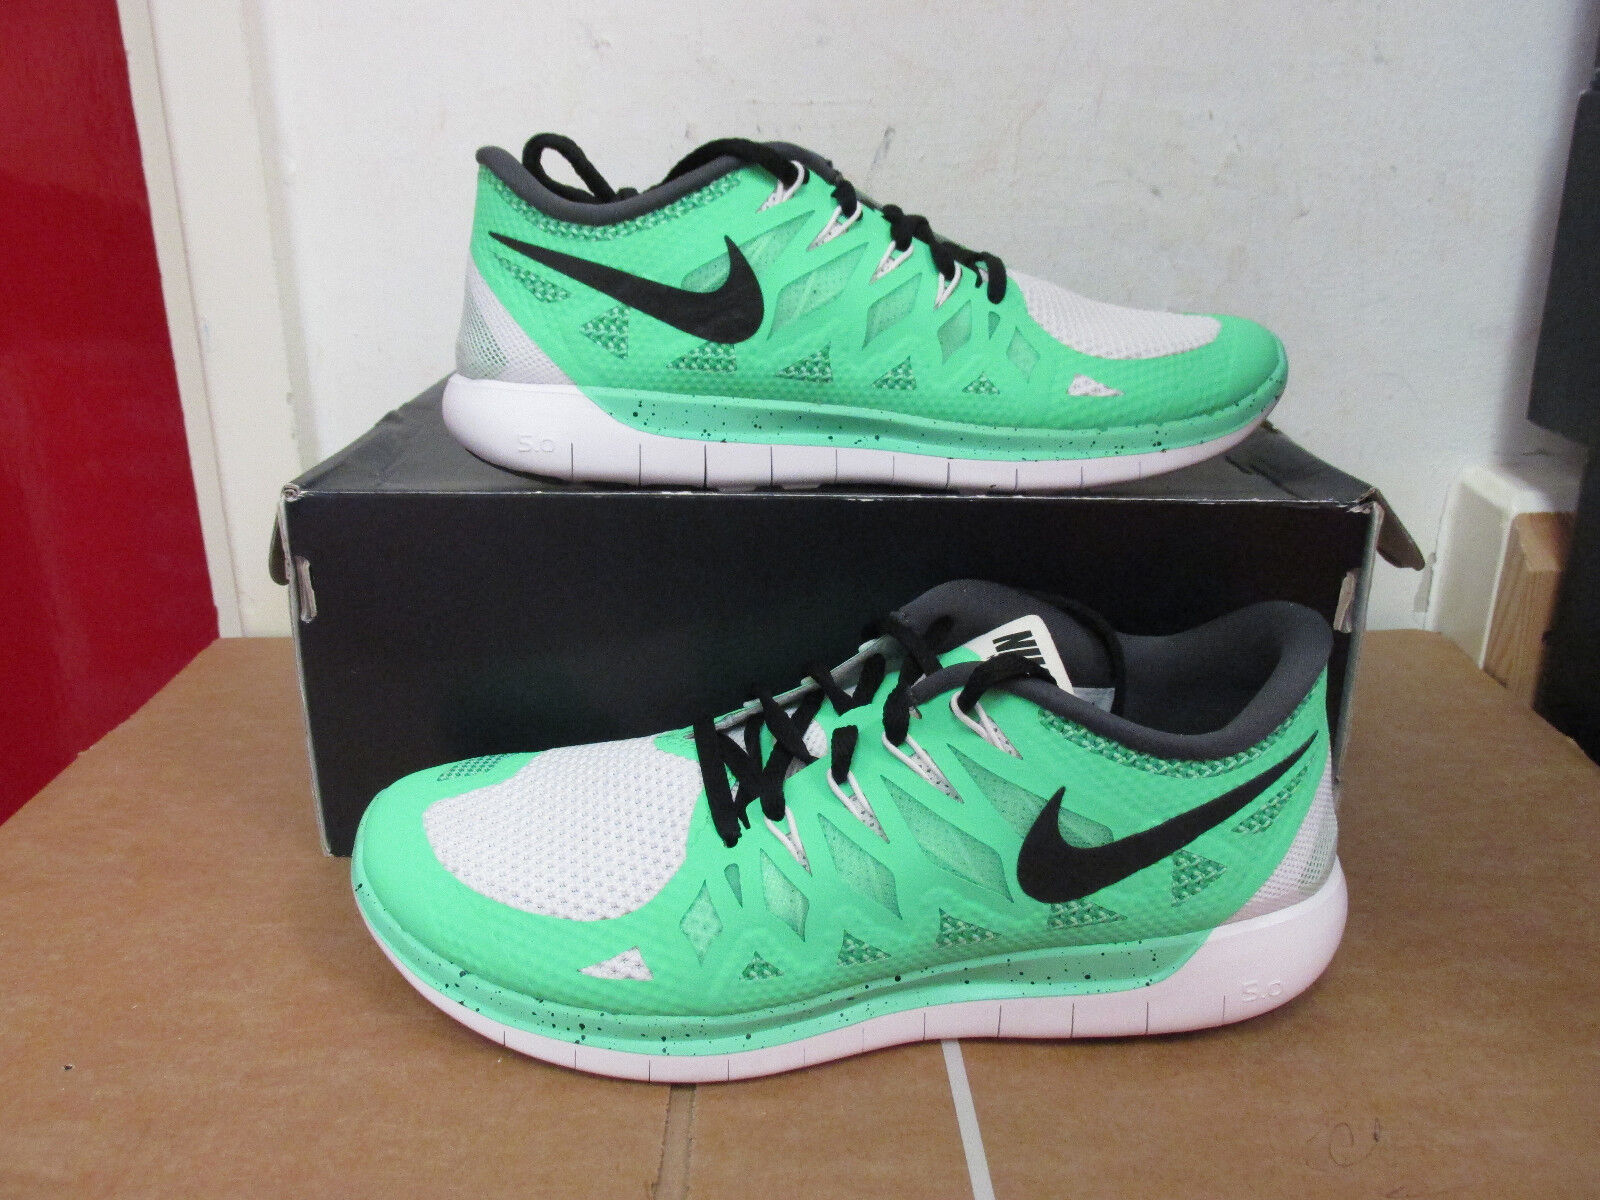 new styles b1737 f3f1e Nike id woens libera 5,0 formatori formatori 5,0 653715 991 scarpe noi 9,5  ue 41 778e53